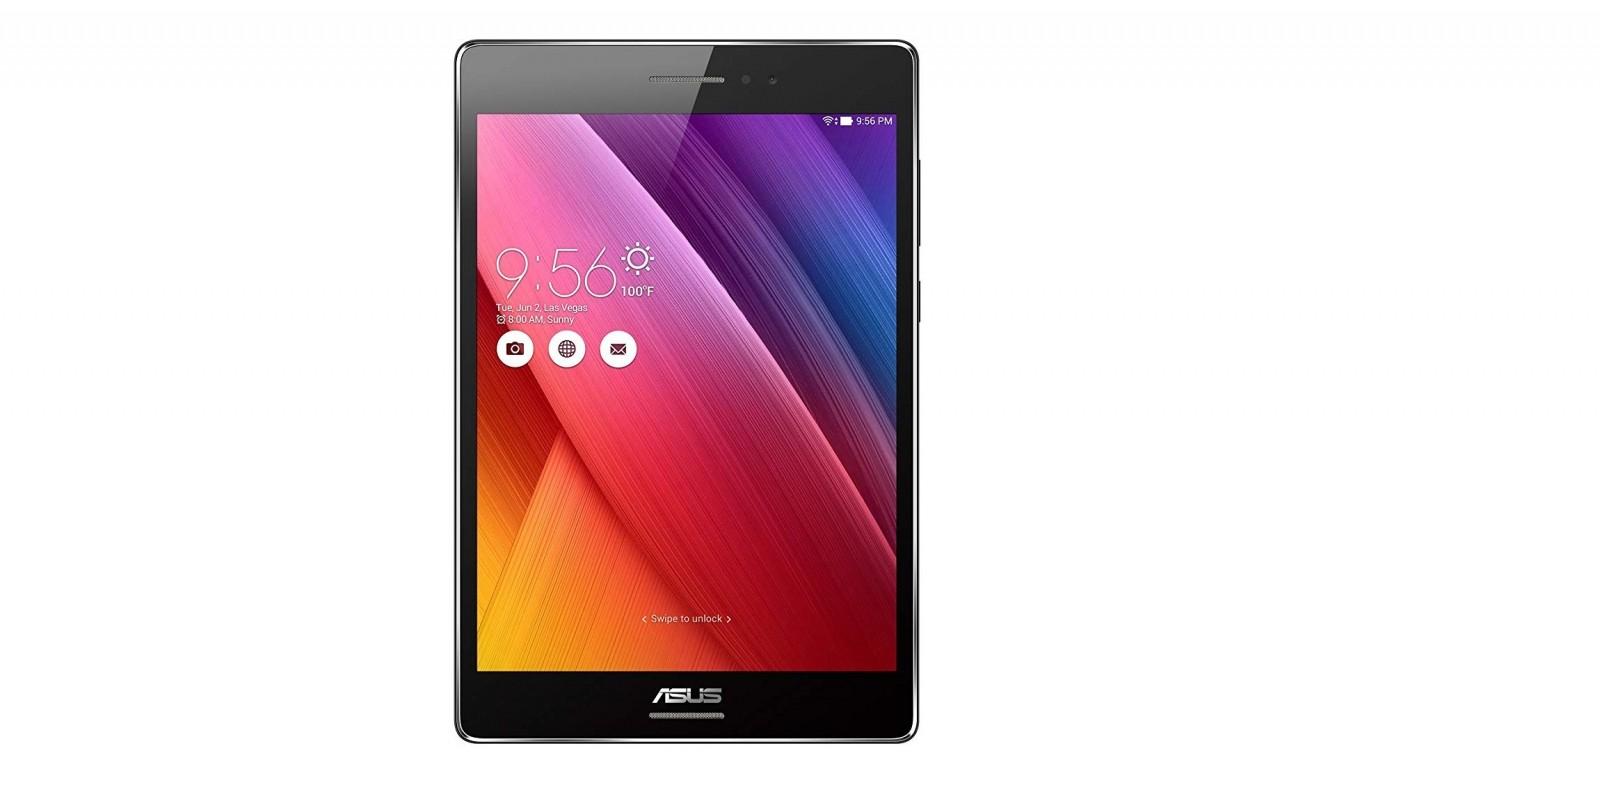 ASUS ZenPad S 8 – Front